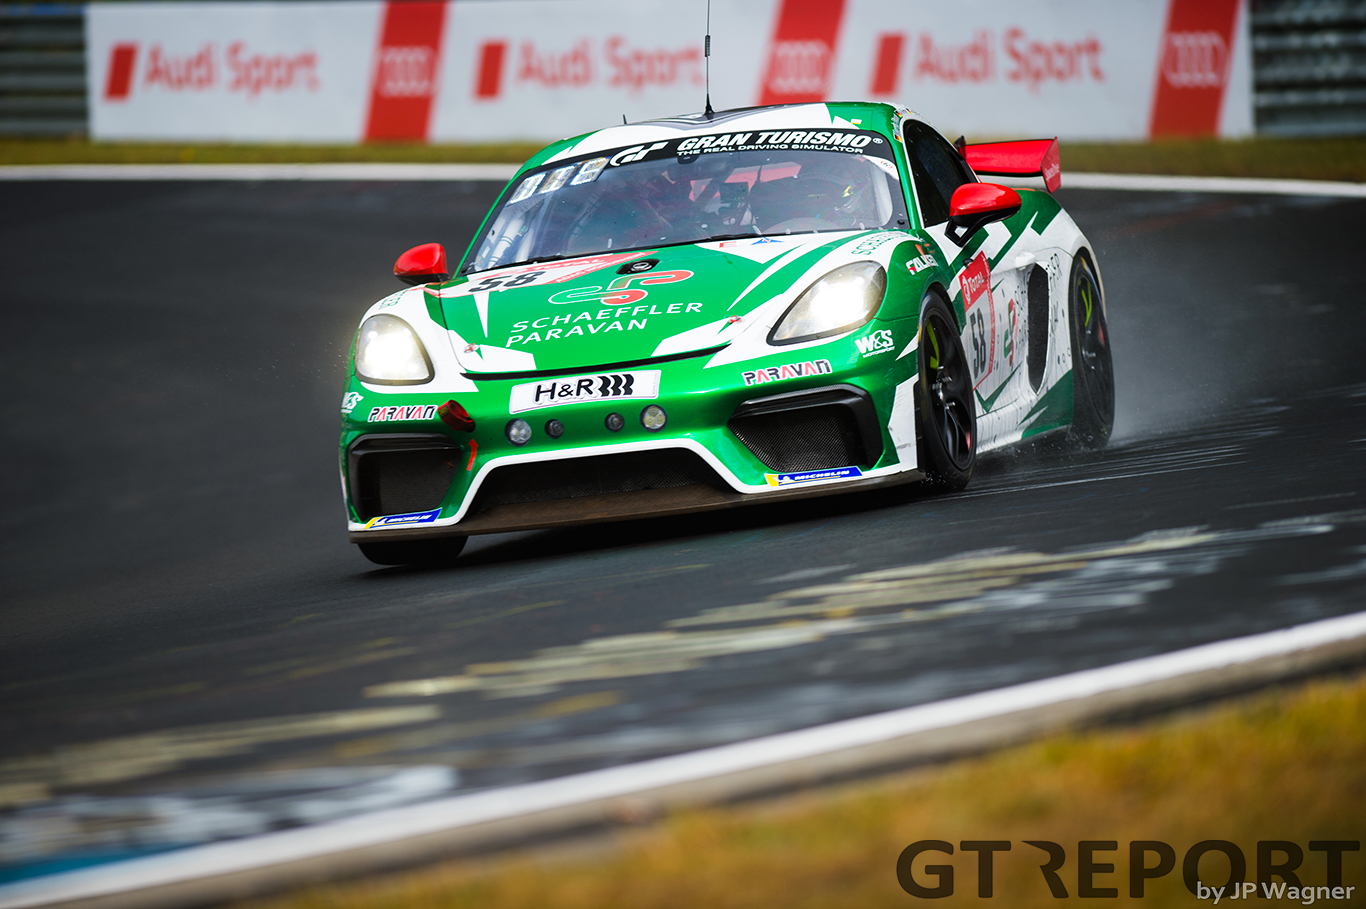 Nürburgring 24 Hours driver report: Tim Scheerbarth – Qualifying